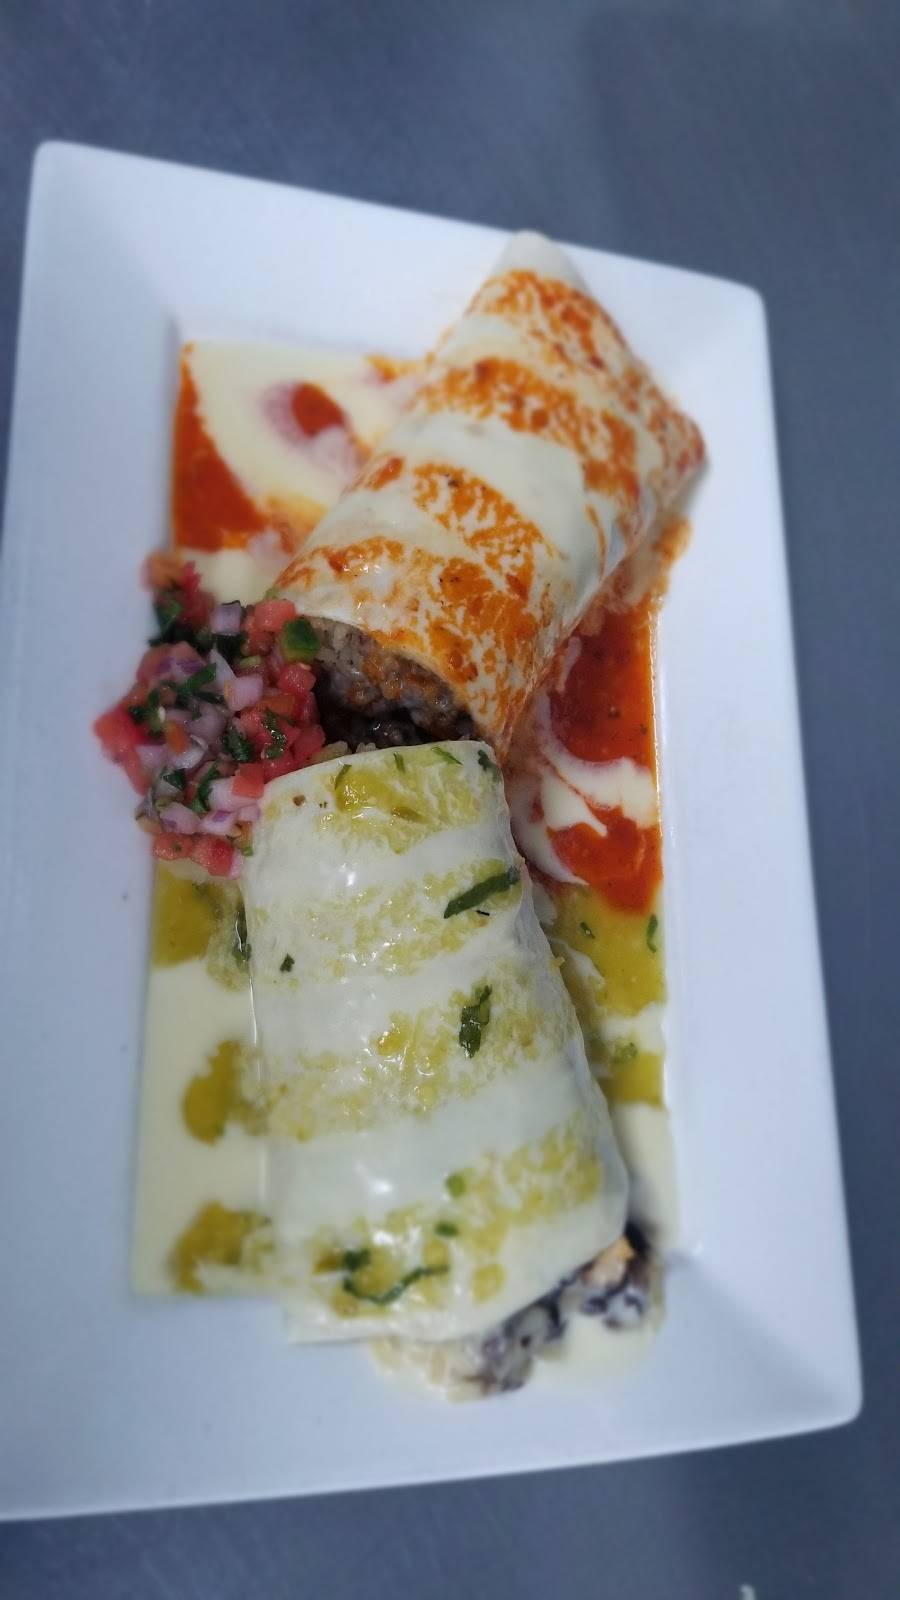 Taqueria Maya Bar and Grill | restaurant | 180 Towne Lake Pkwy, Woodstock, GA 30188, USA | 7706274503 OR +1 770-627-4503